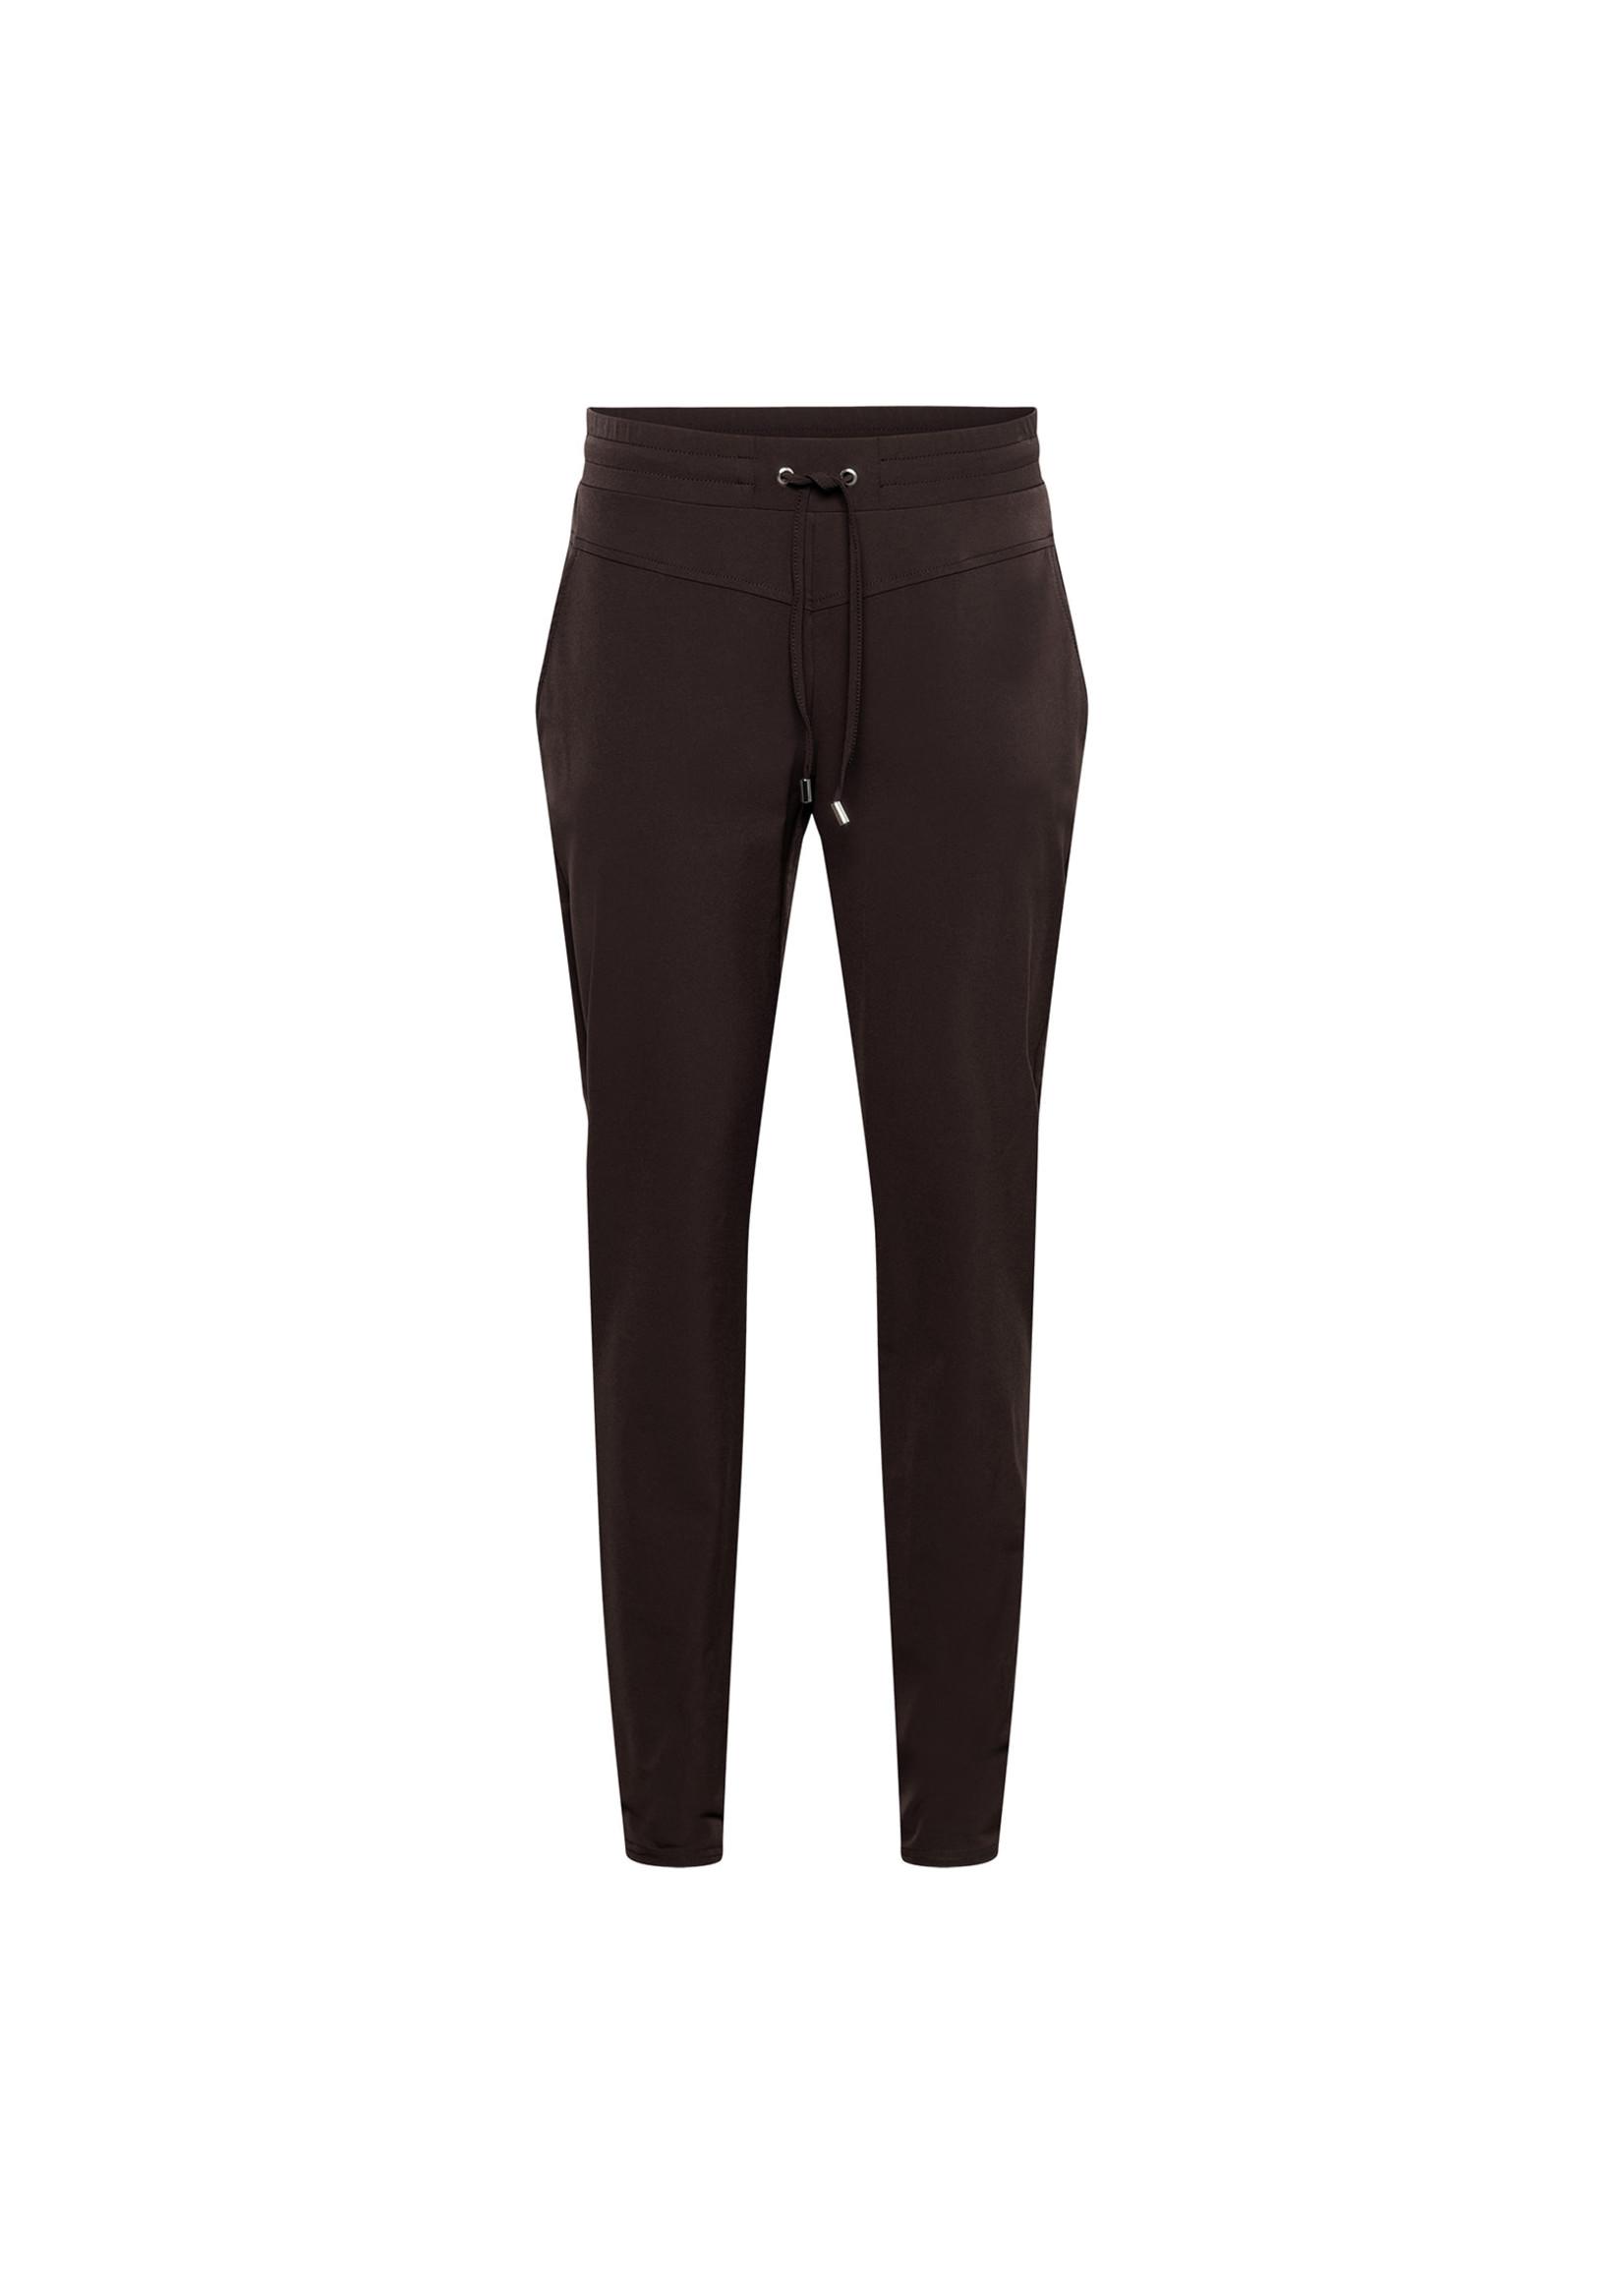 &Co Women penny pants (brown)